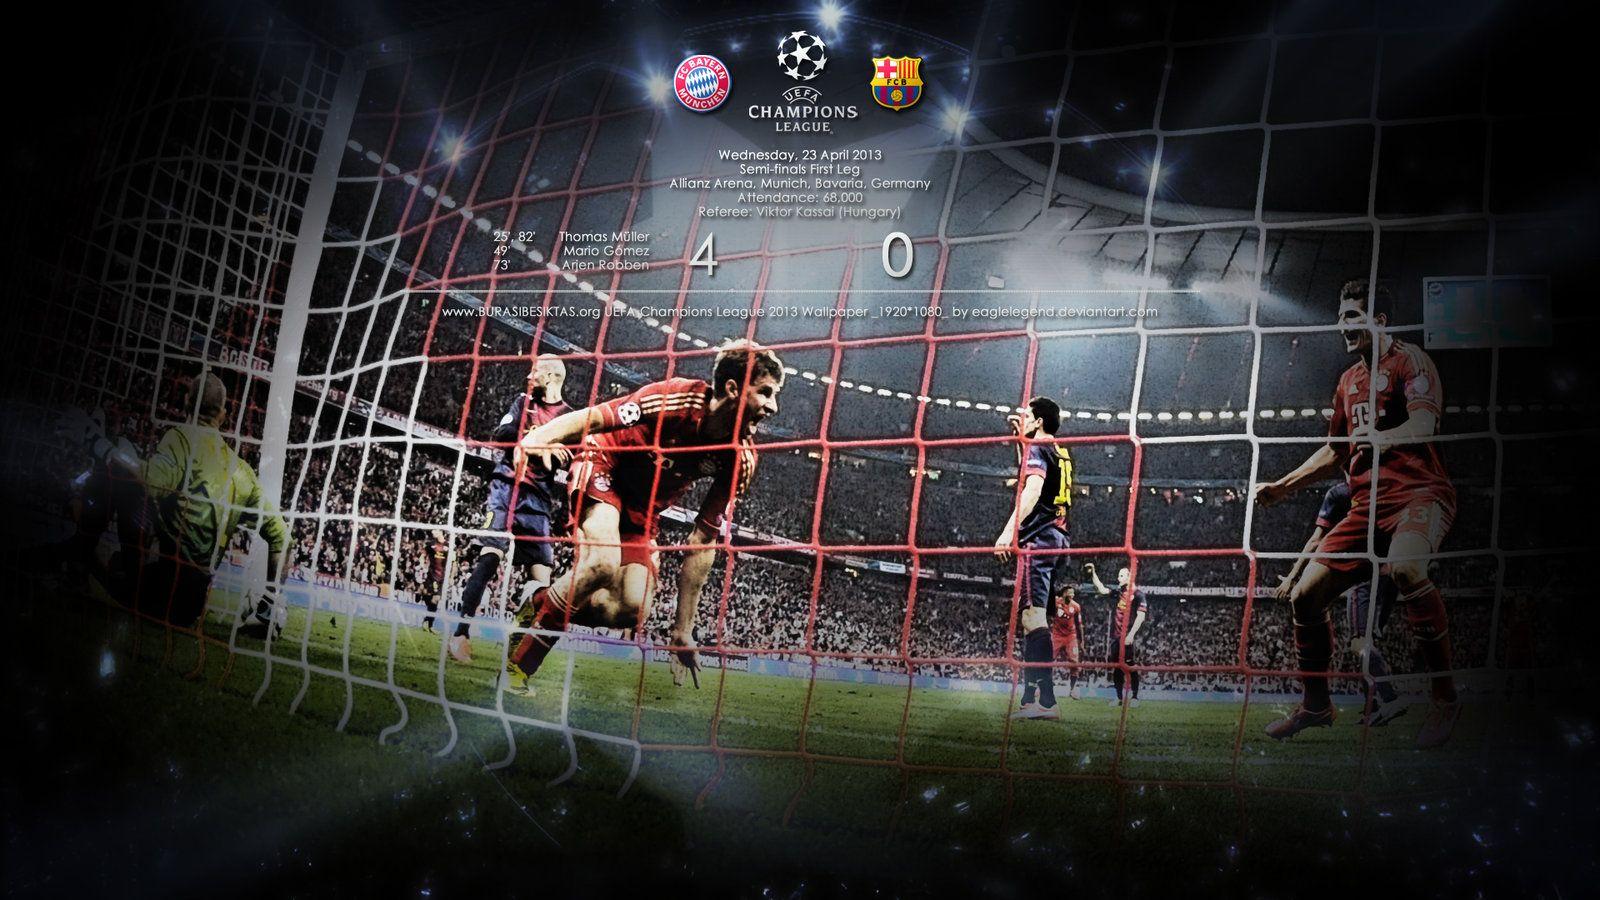 Bayern Munich Vs Barcelona Wallpaper By Eaglelegend Deviantart Com On Deviantart Bayern Munich Wallpapers Bayern Munich Bayern